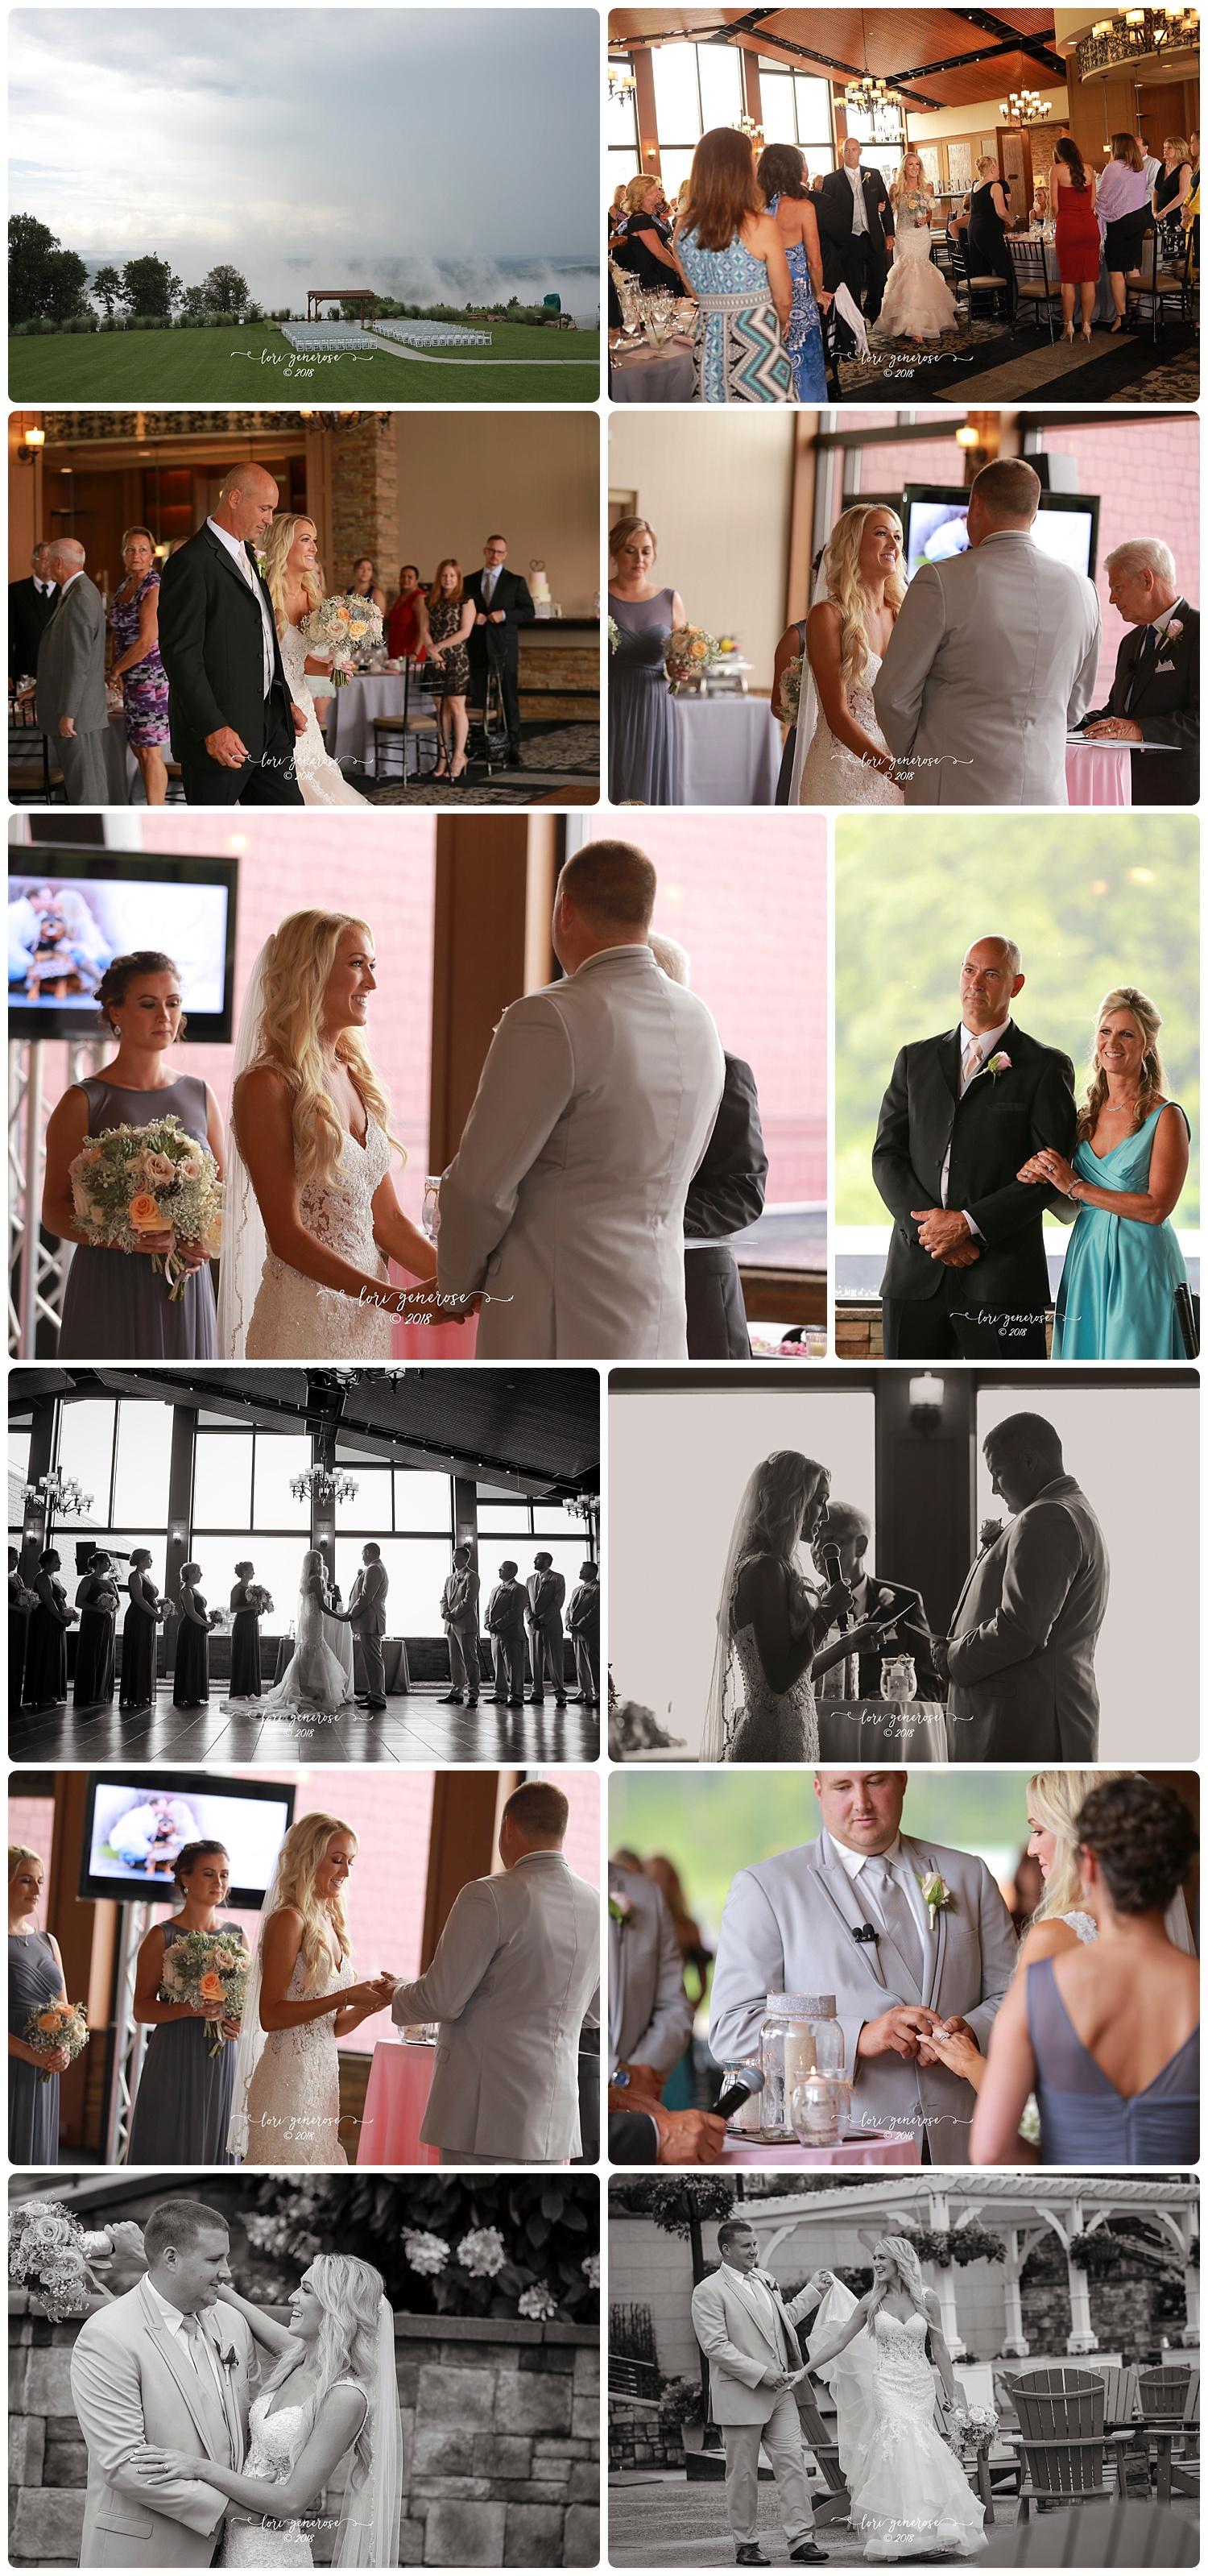 lgphotographylorigenerosebluemountainresortweddingpalmertonpaweddingceremony.jpg